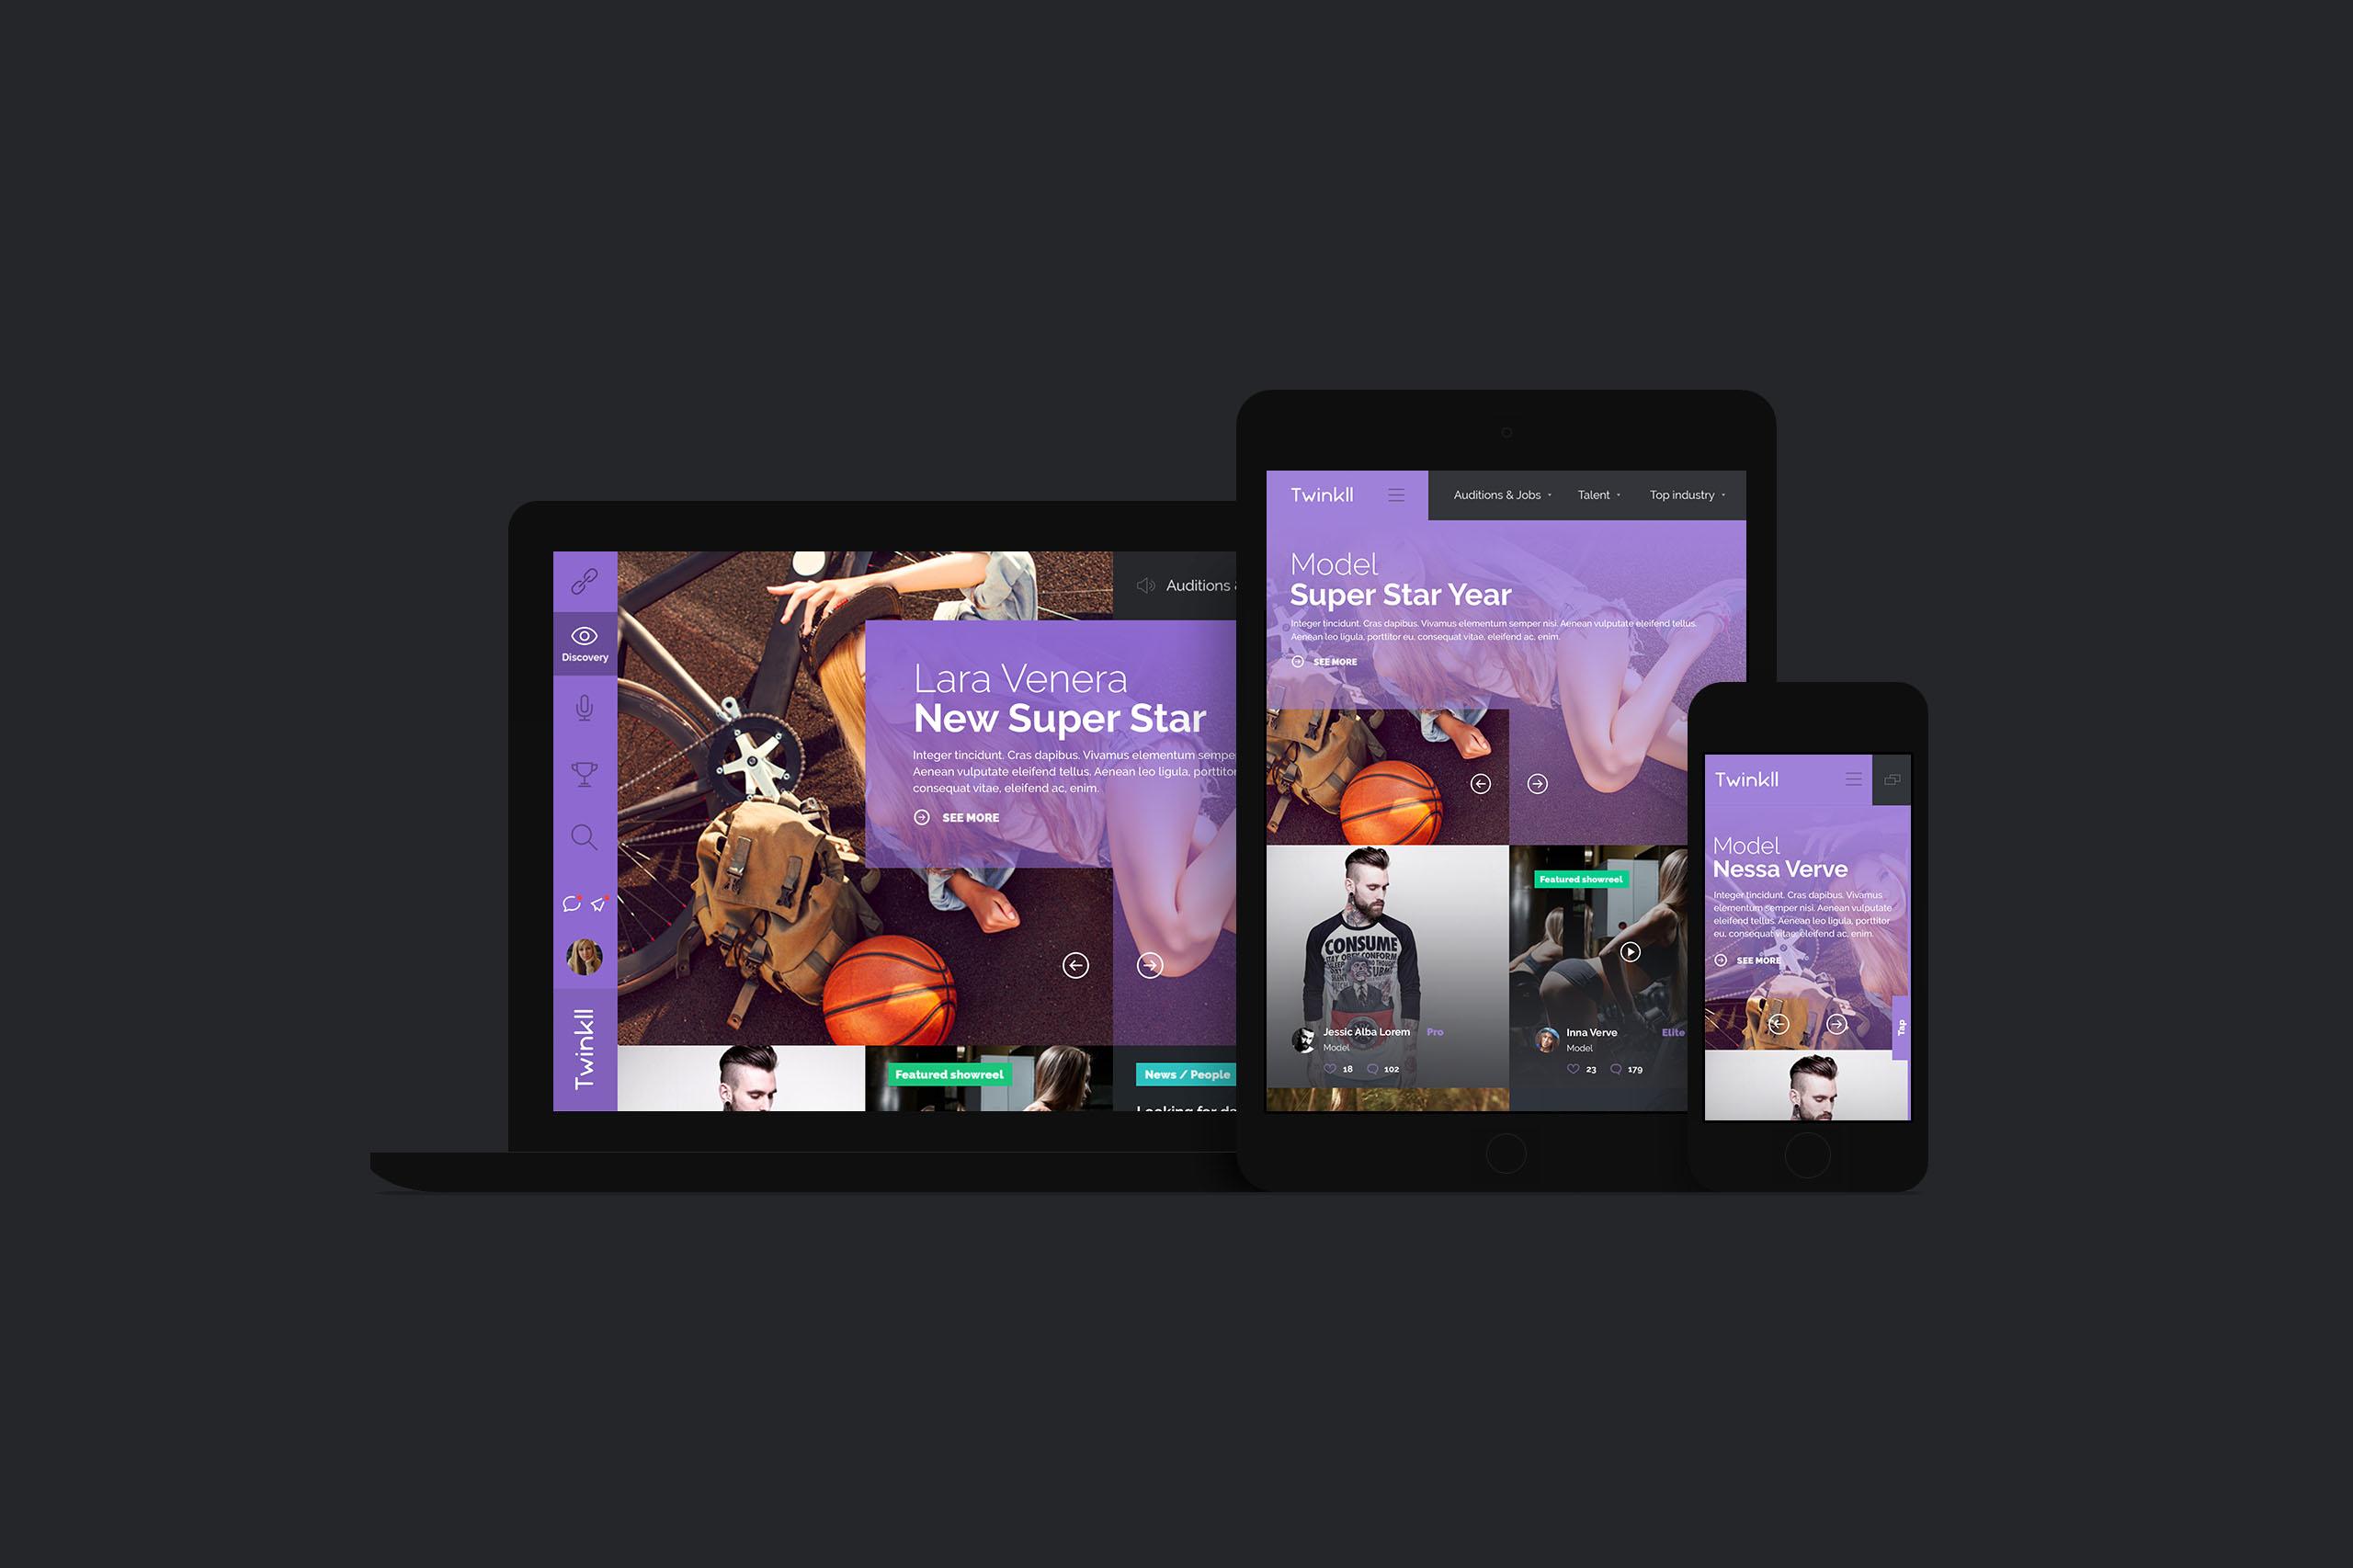 Twinkll-all-devices-social-online-casting-audition-service-website-by-basov-design-bureau-italy-responsive-model-artist-black-dark-find-person_1